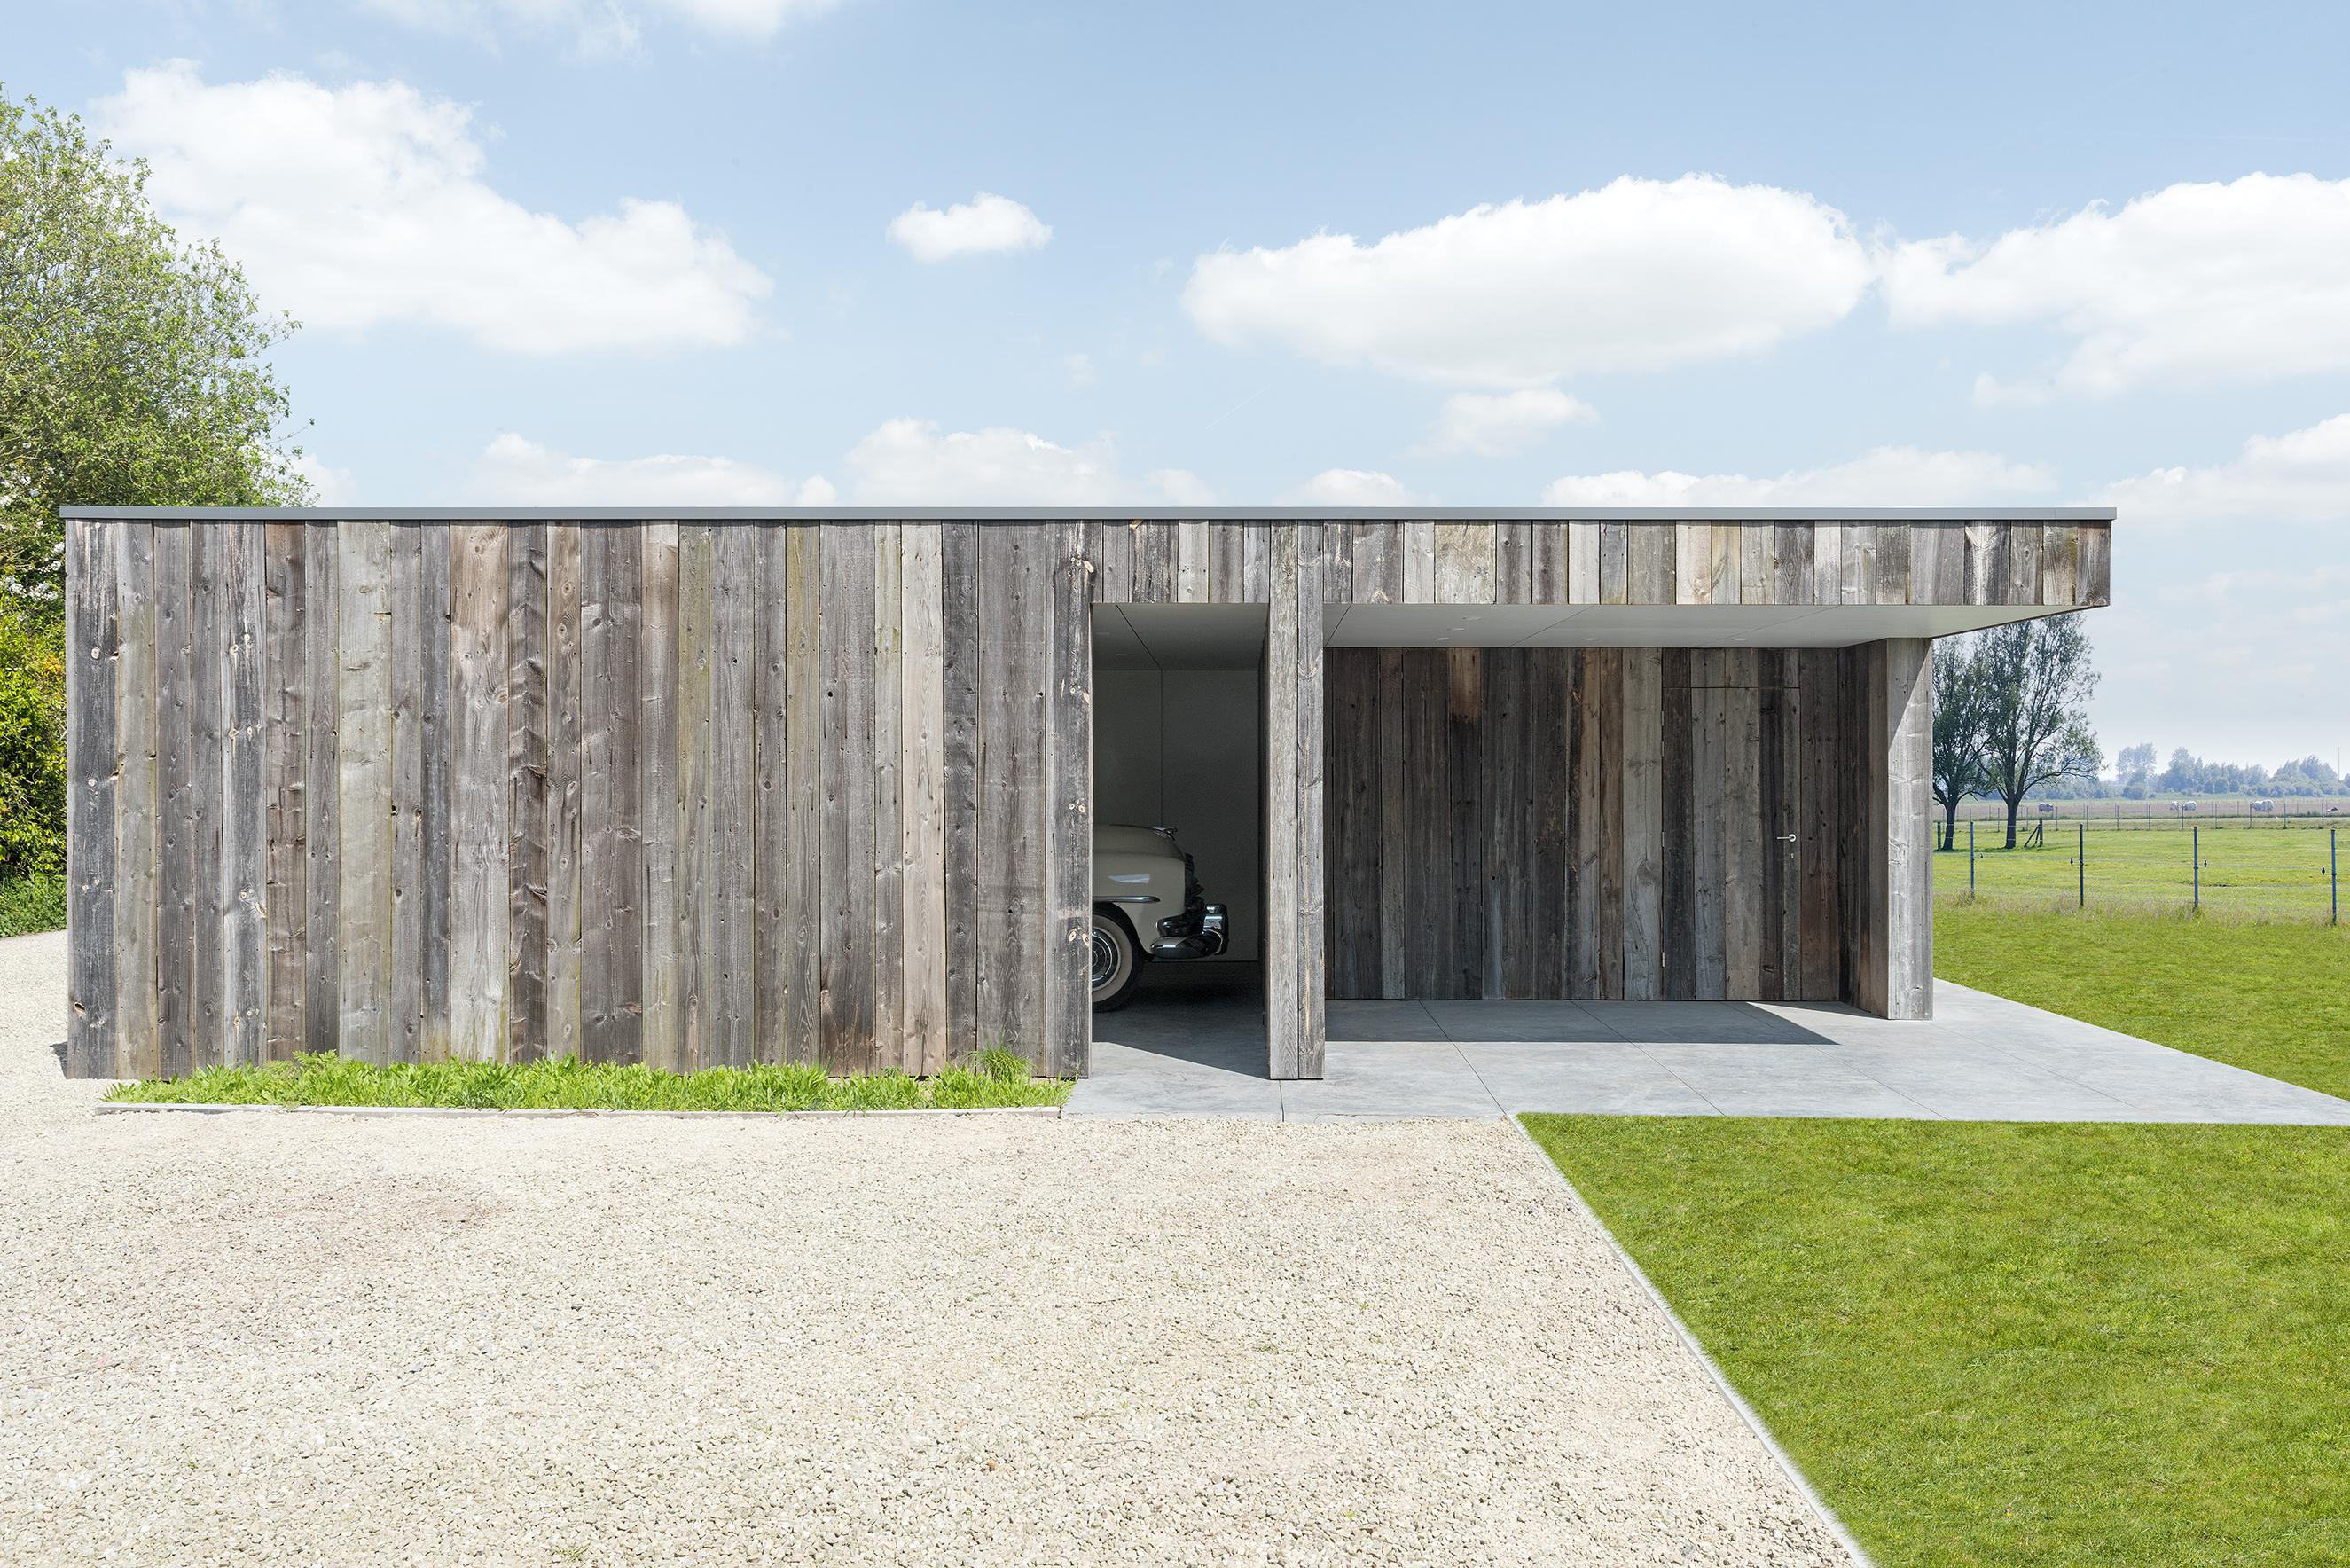 carport double en bois avec remise et terrasse couverte olsene livinlodge. Black Bedroom Furniture Sets. Home Design Ideas